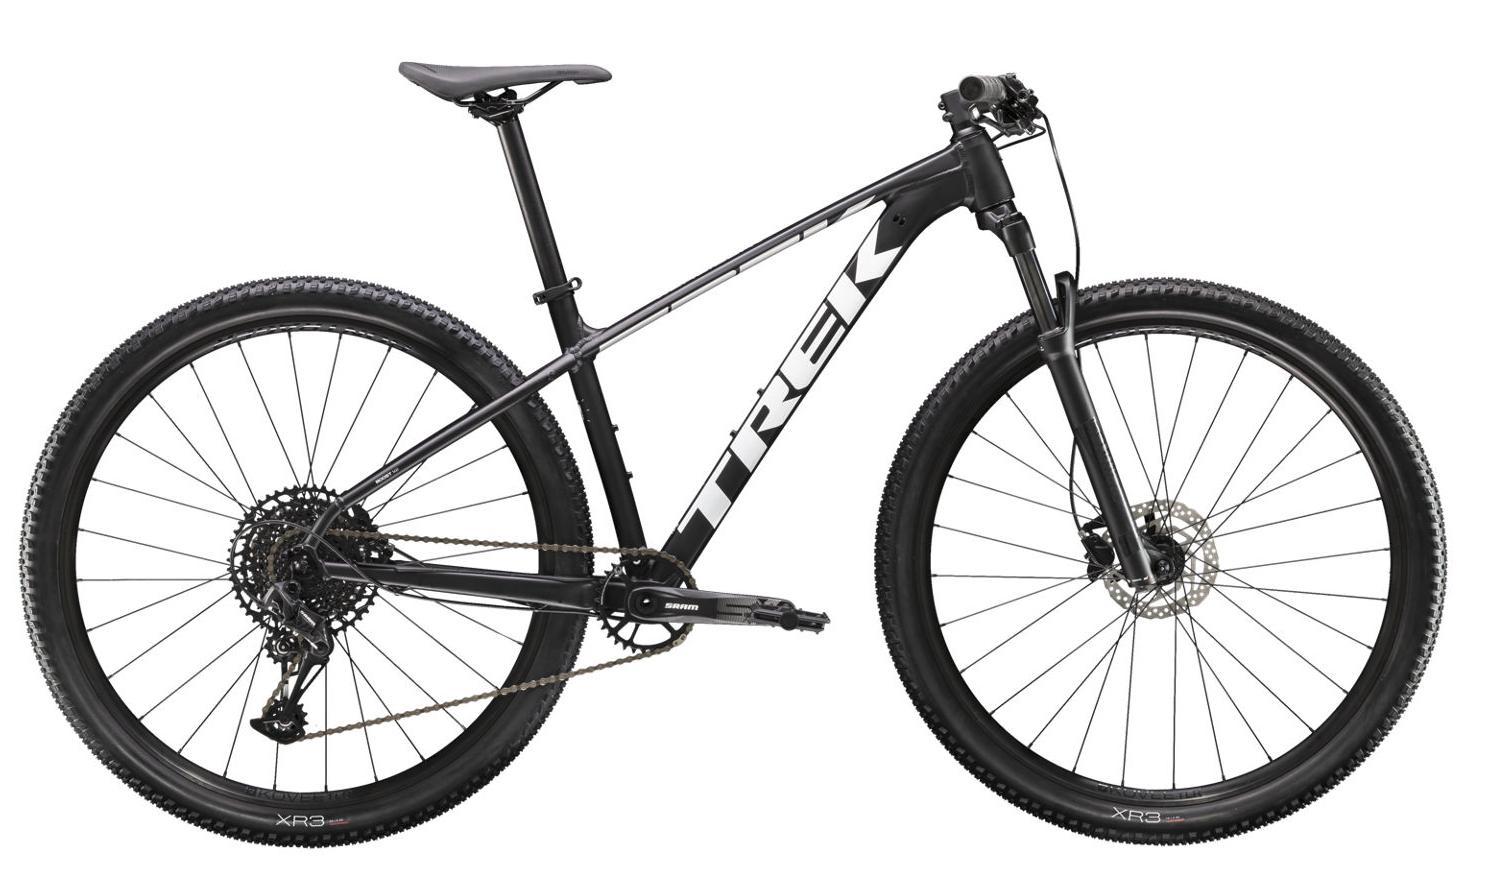 TREK 1x 12 X Caliber 8 No Limits Biking